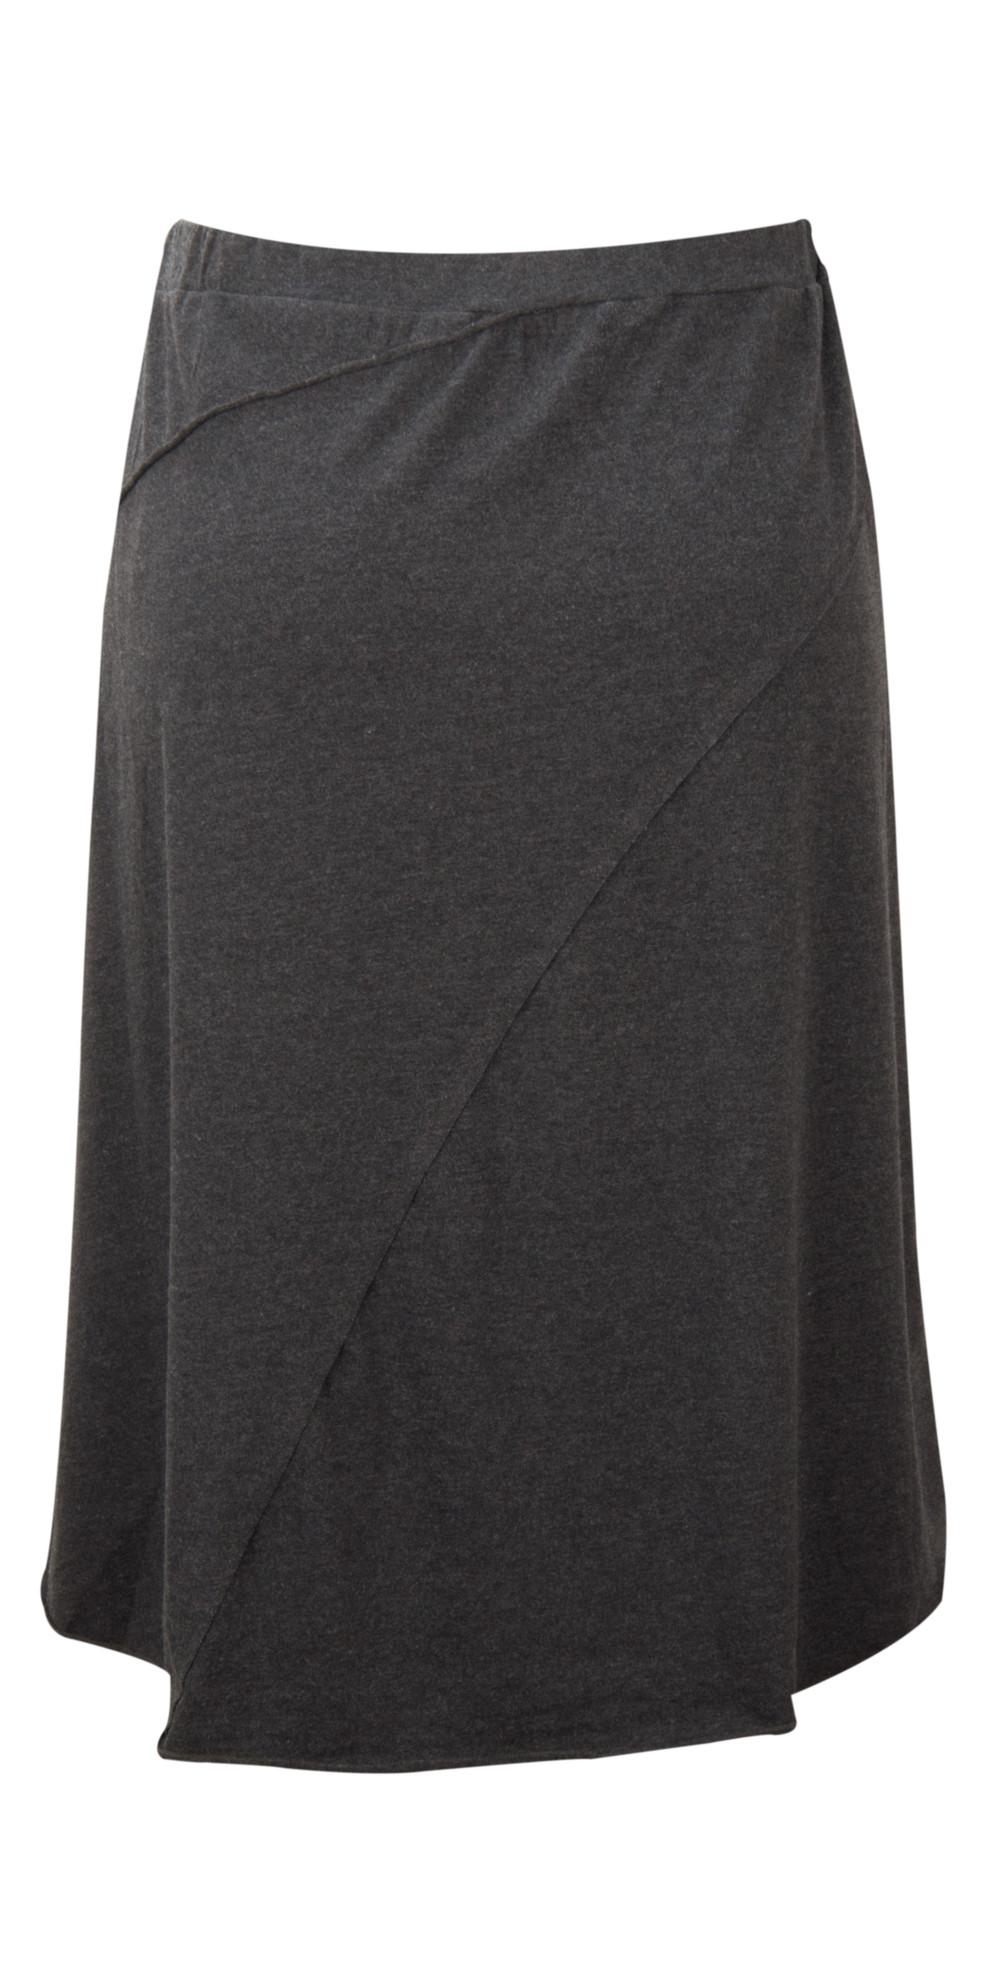 Brushed Jersey Skirt main image